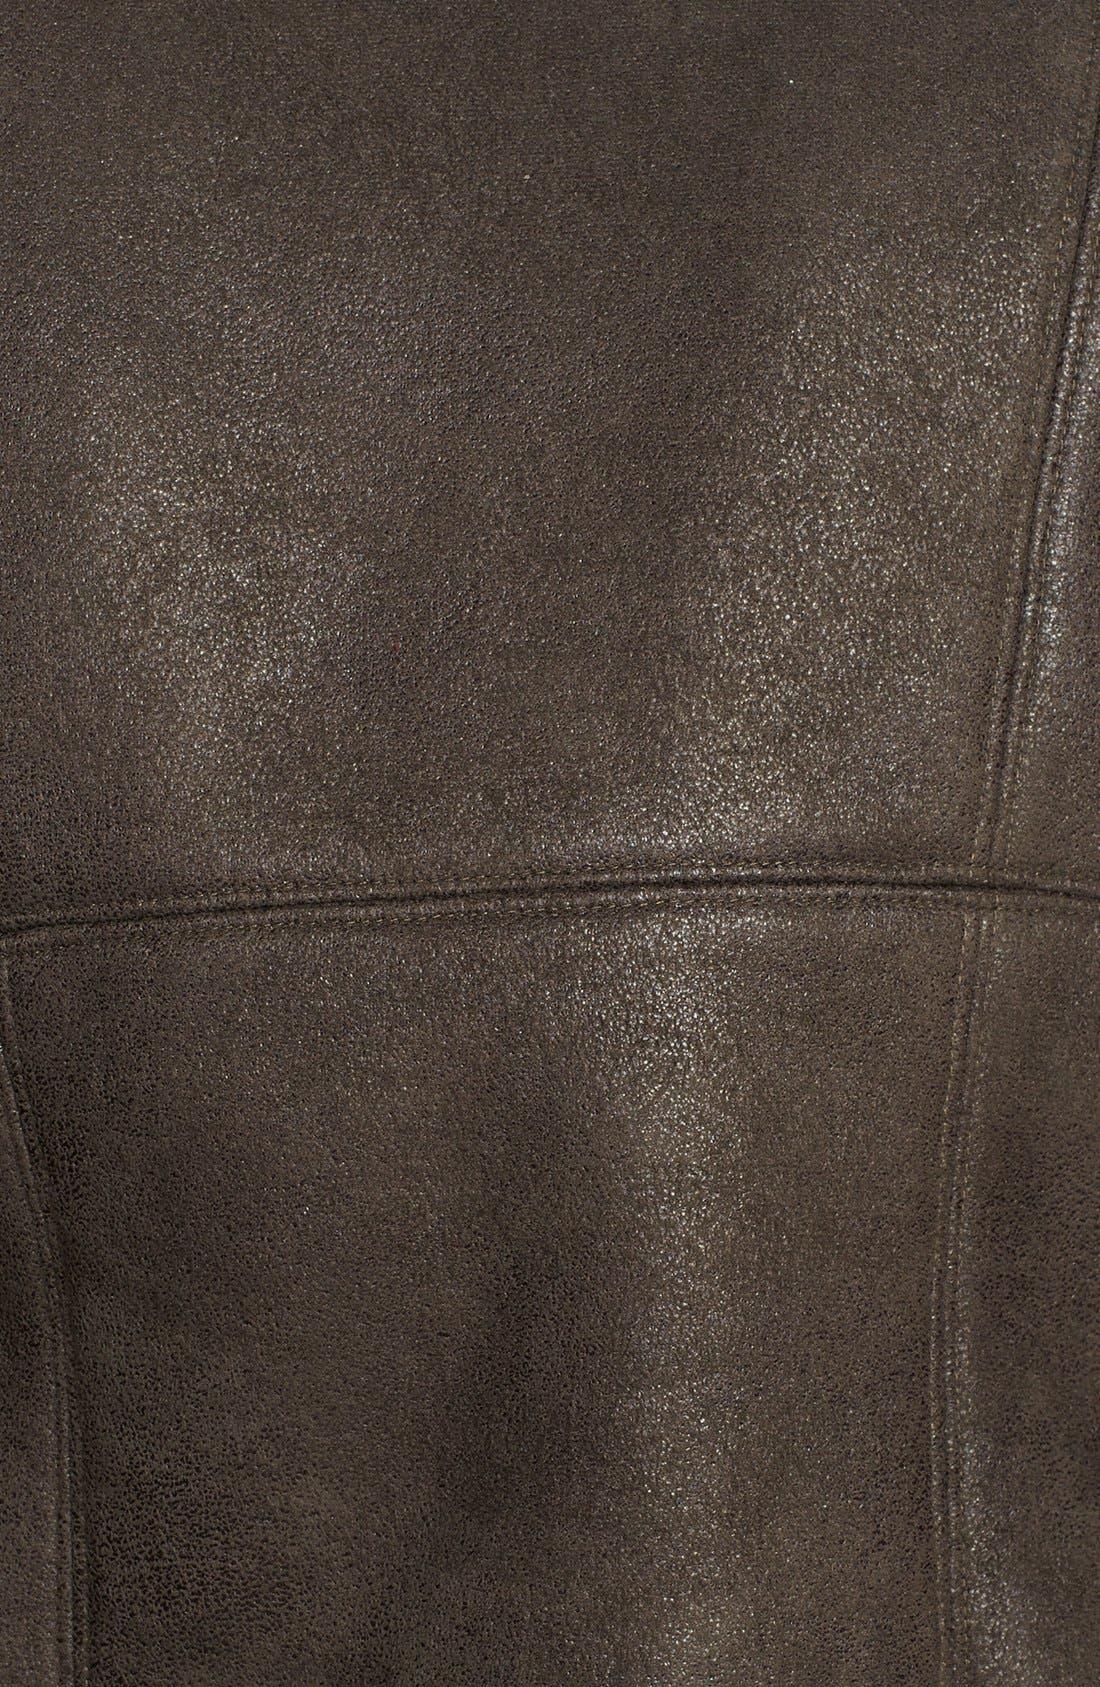 Faux Shearling Moto Jacket,                             Alternate thumbnail 2, color,                             341